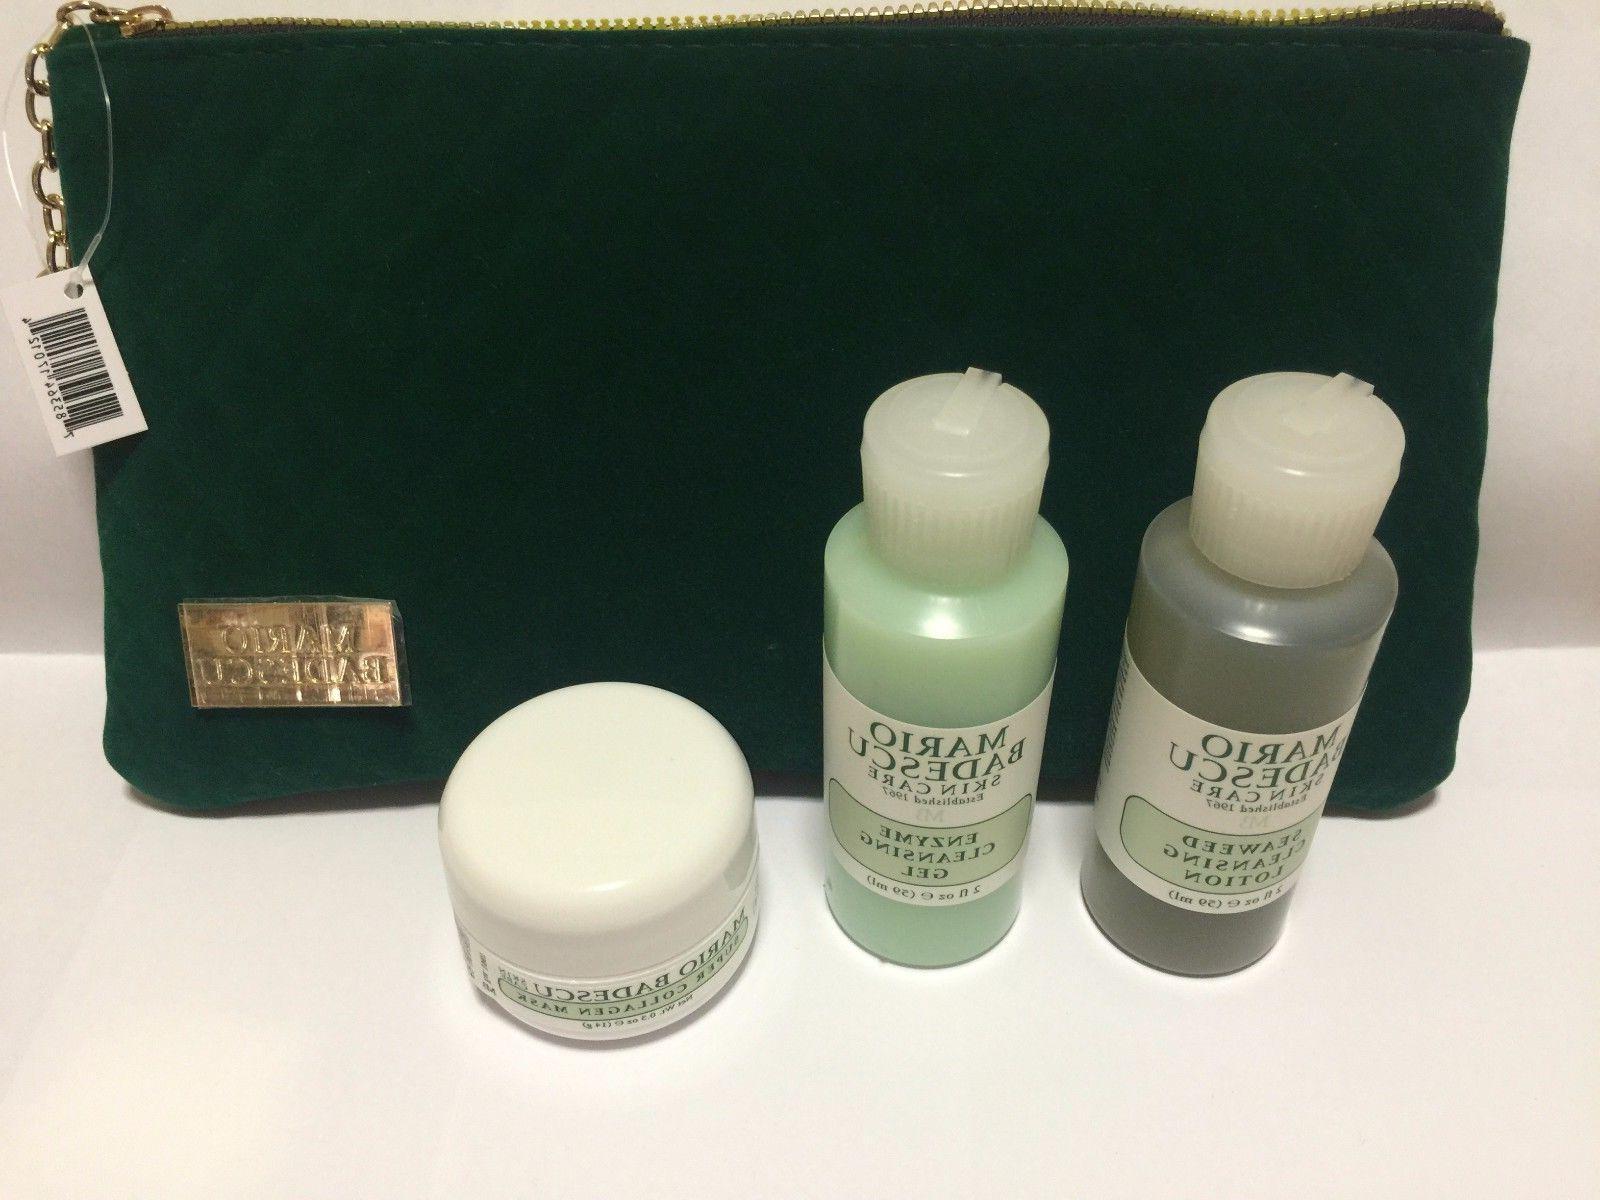 Mario Badescu Gift Set Super Collagen Mask Skincare Seaweed